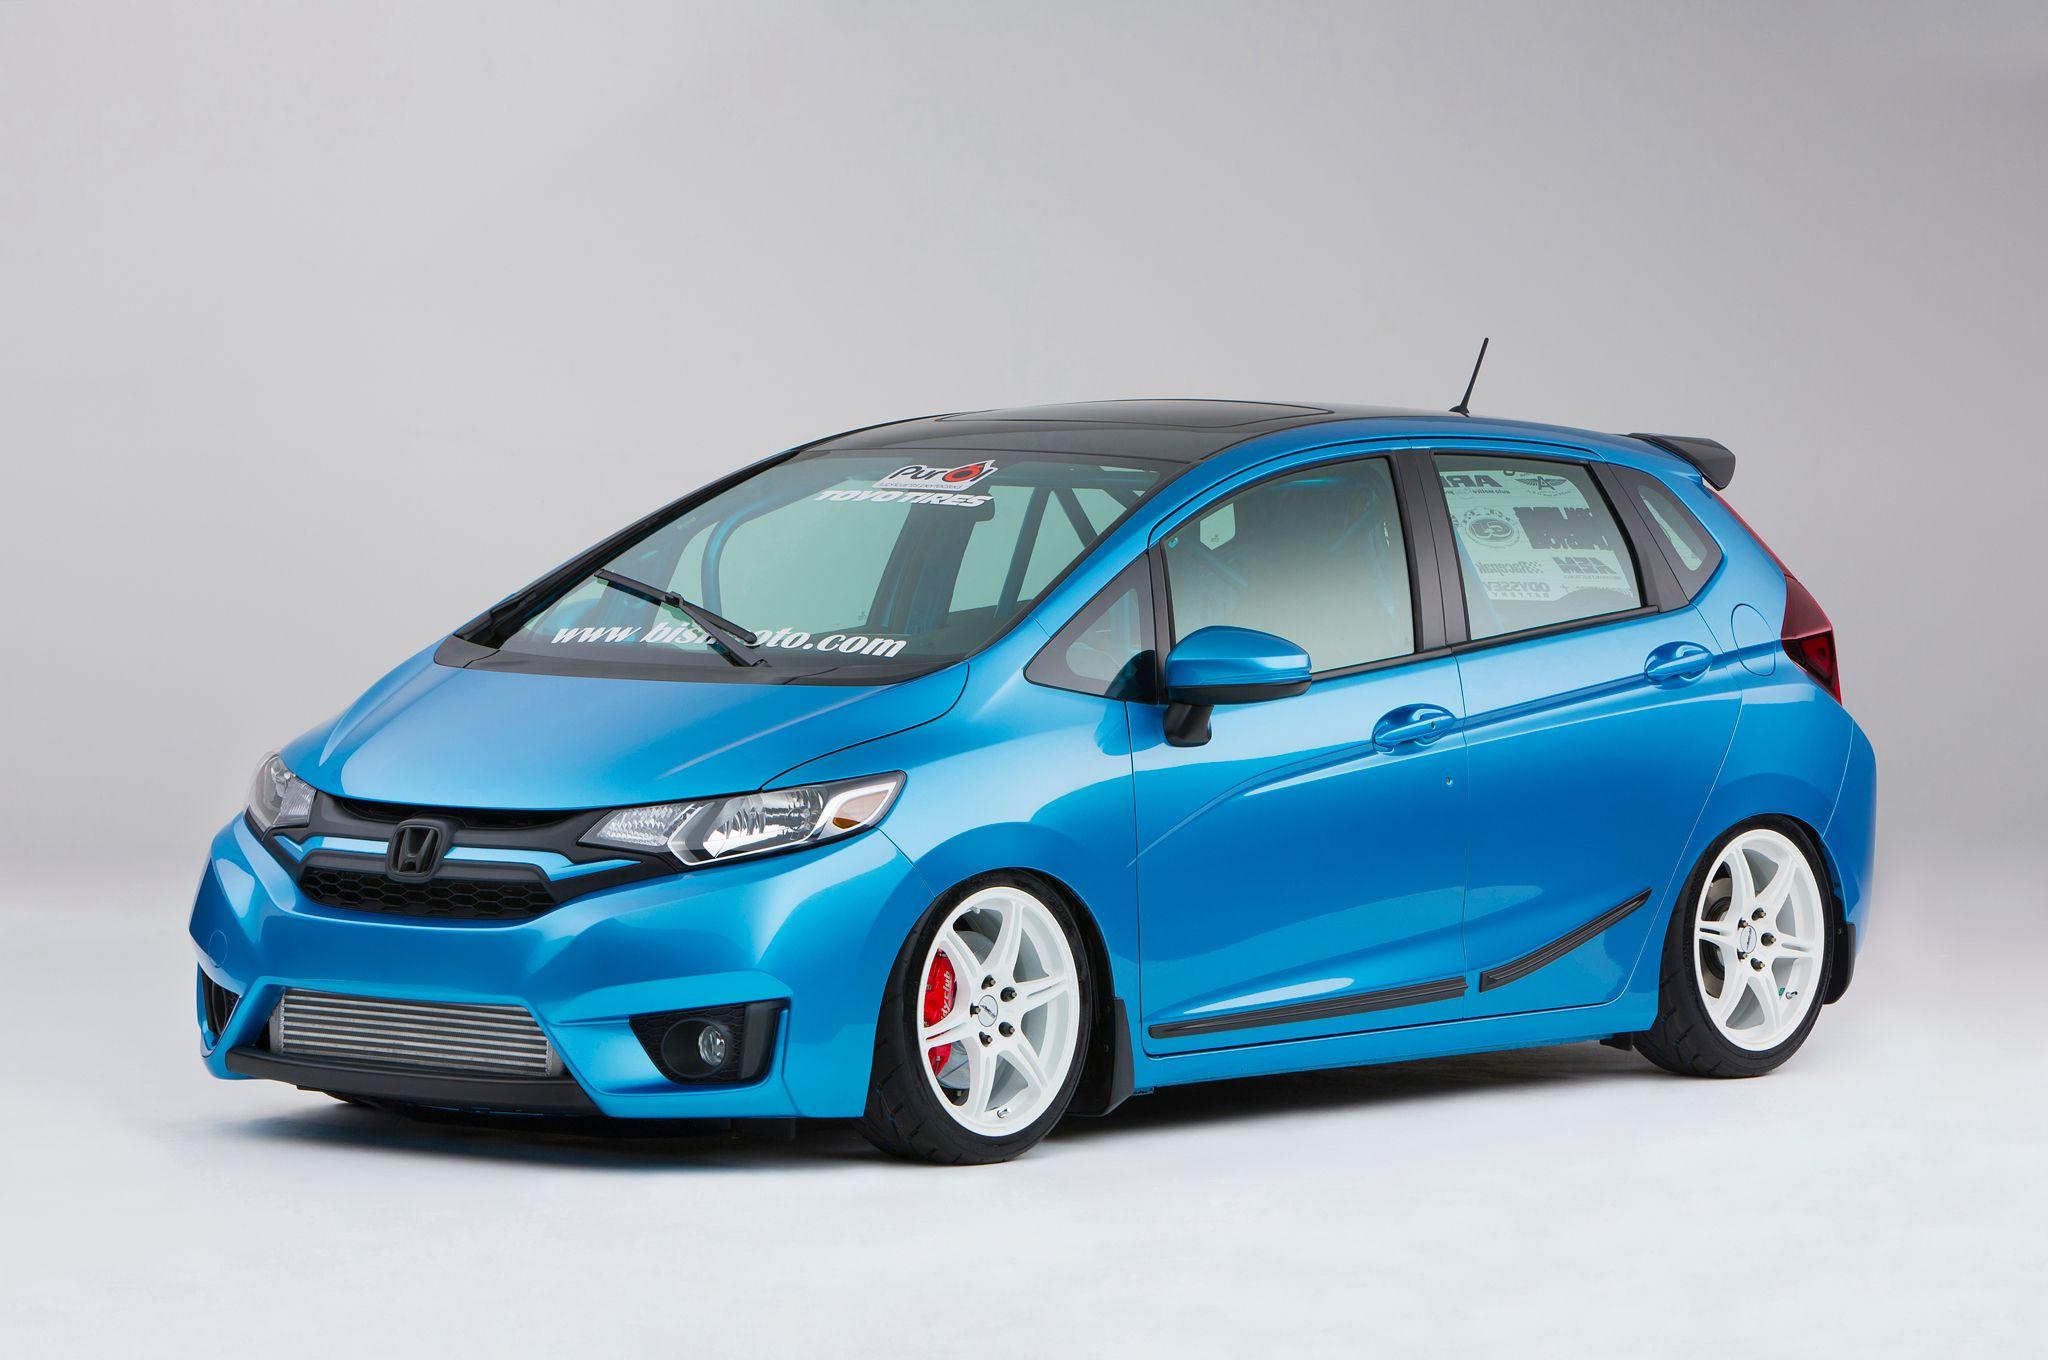 9 Modified 2015 Honda Fit Hatchbacks Debut at SEMA 車 と フィット